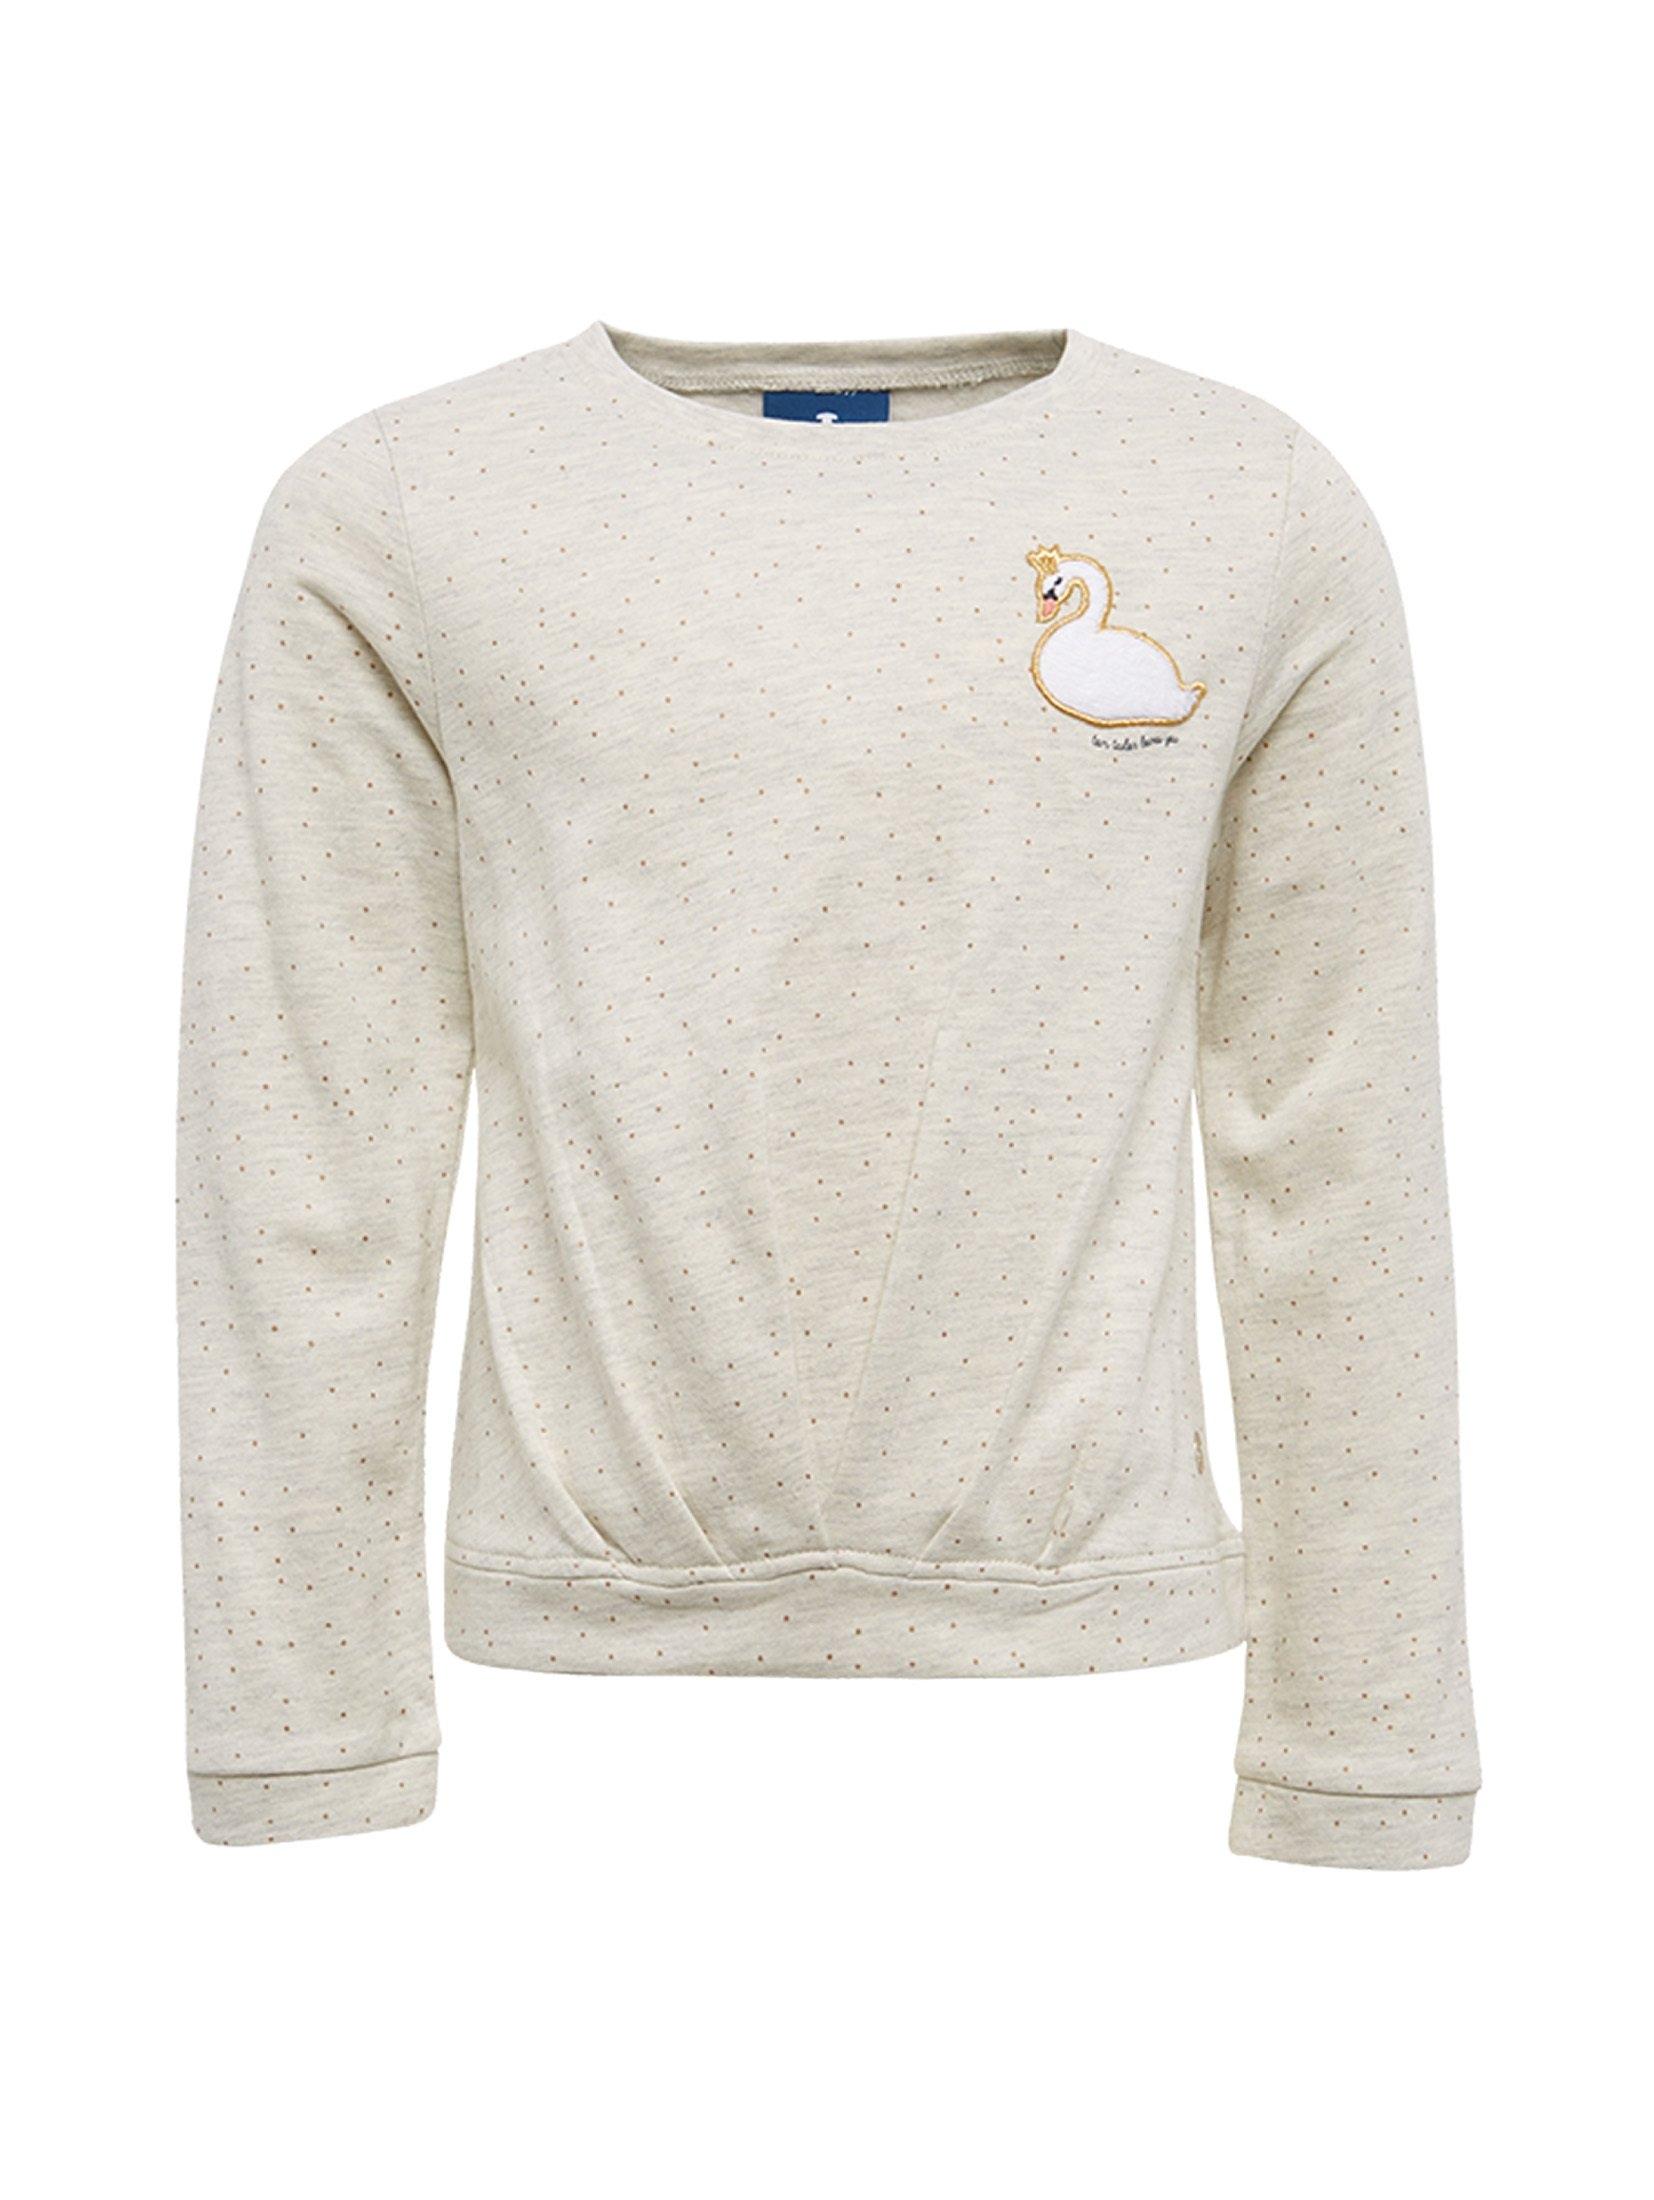 TOM TAILOR sweater »Gepunktetes Sweatshirt mit Patch« online kopen op otto.nl